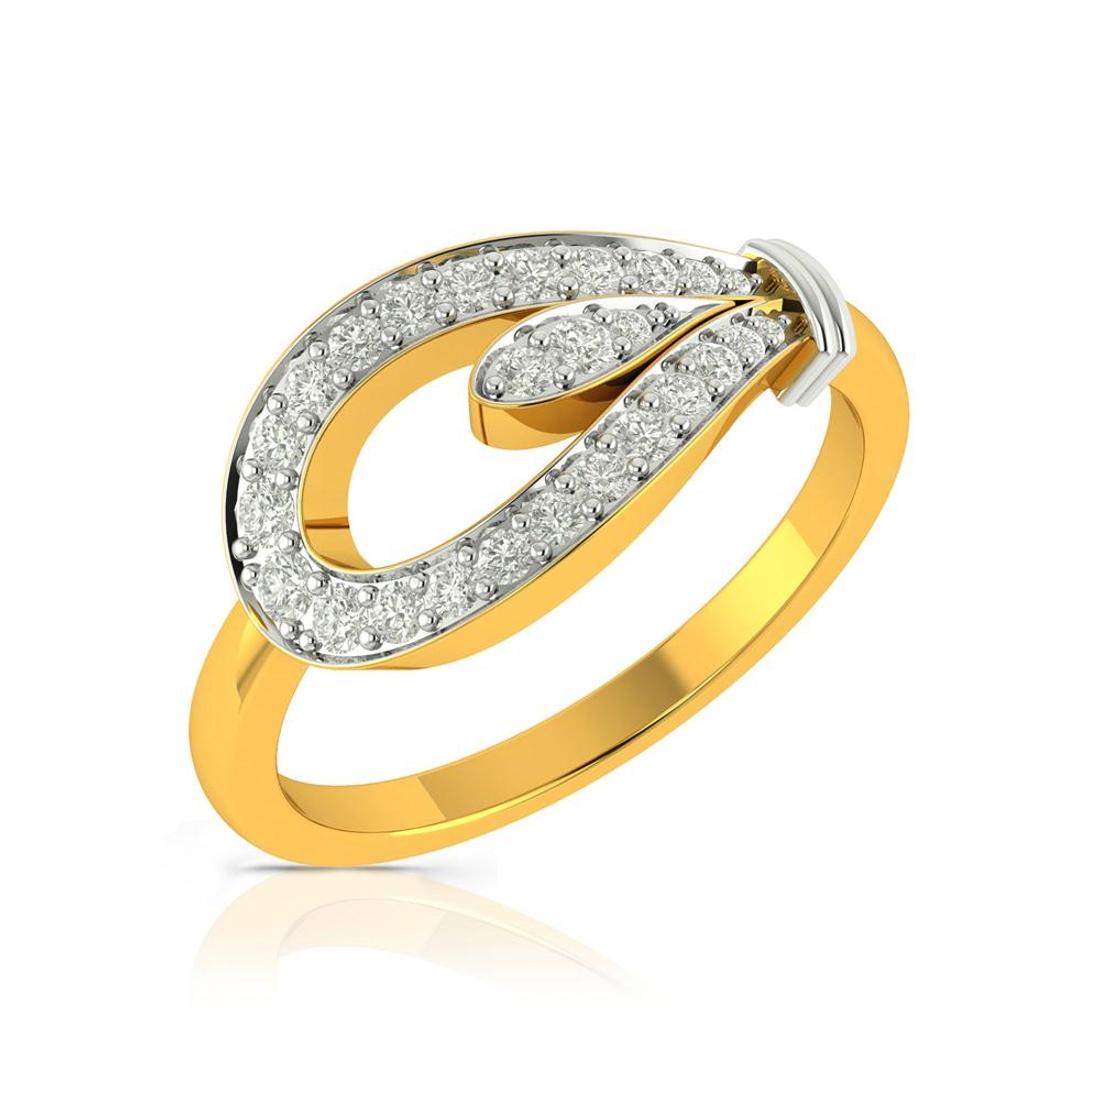 Buy Charu Jewels Diamond Ladies Ring CJLR0496 Online in India